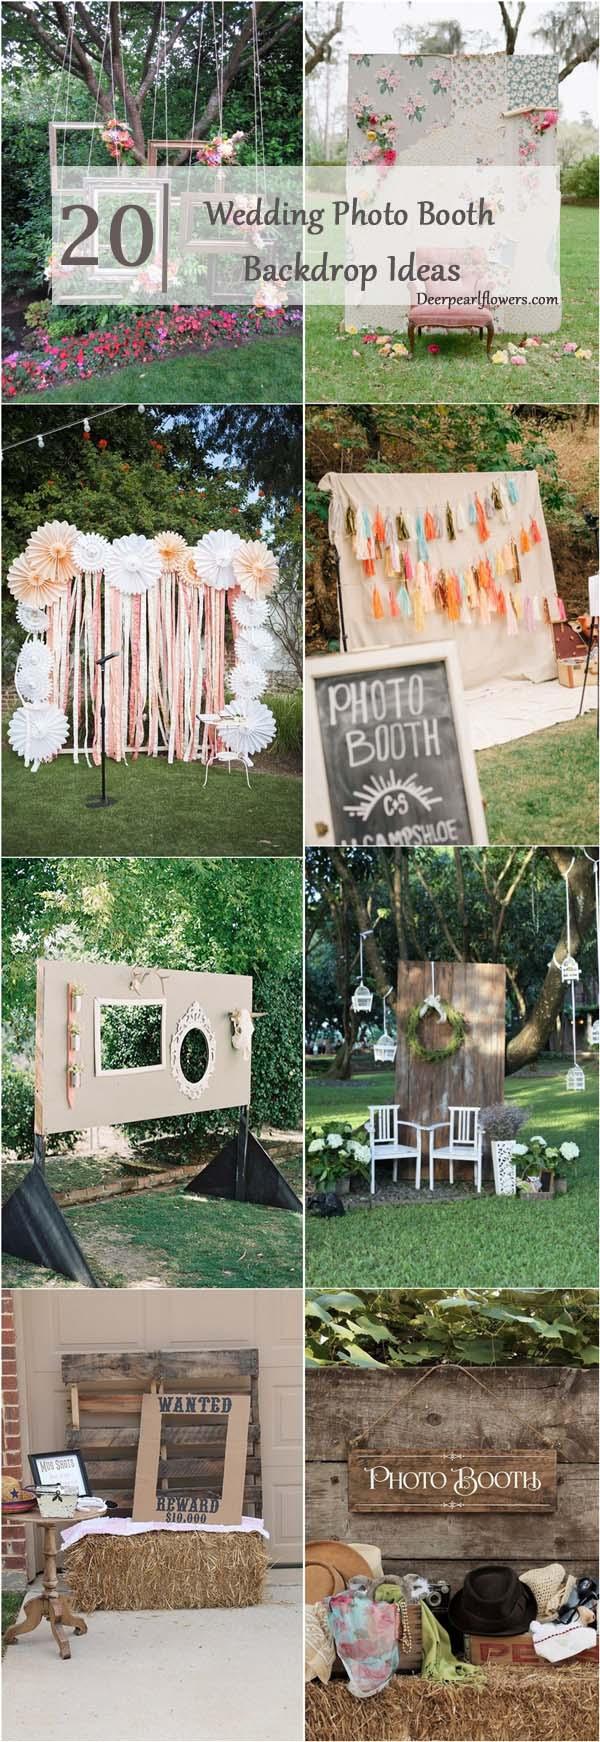 Diy Wedding Photobooth 20 Brilliant Wedding Photo Booth Ideas Deer Pearl Flowers